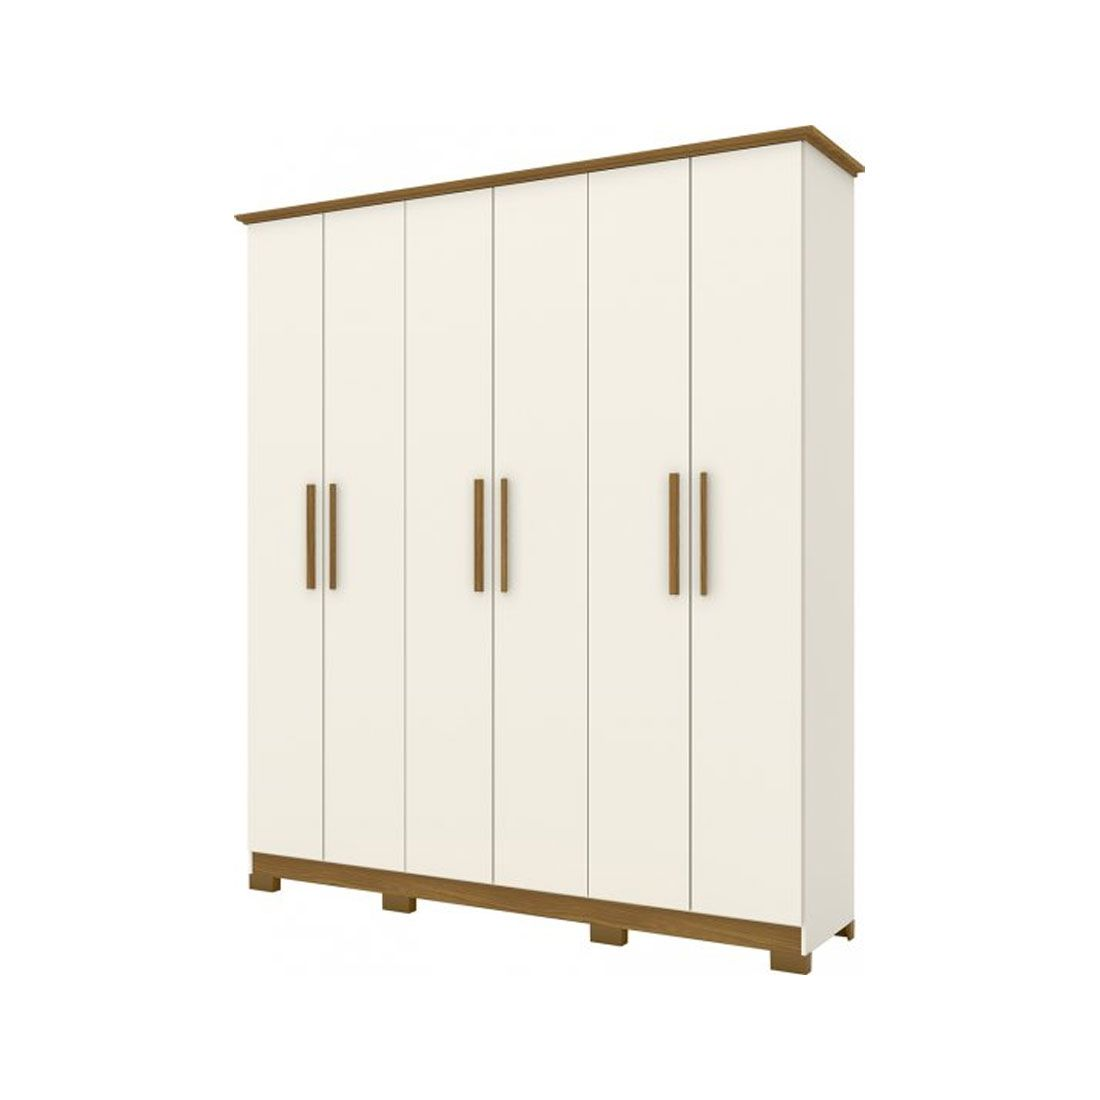 Guarda Roupa Henn 6 portas CoverOFF White/Nature